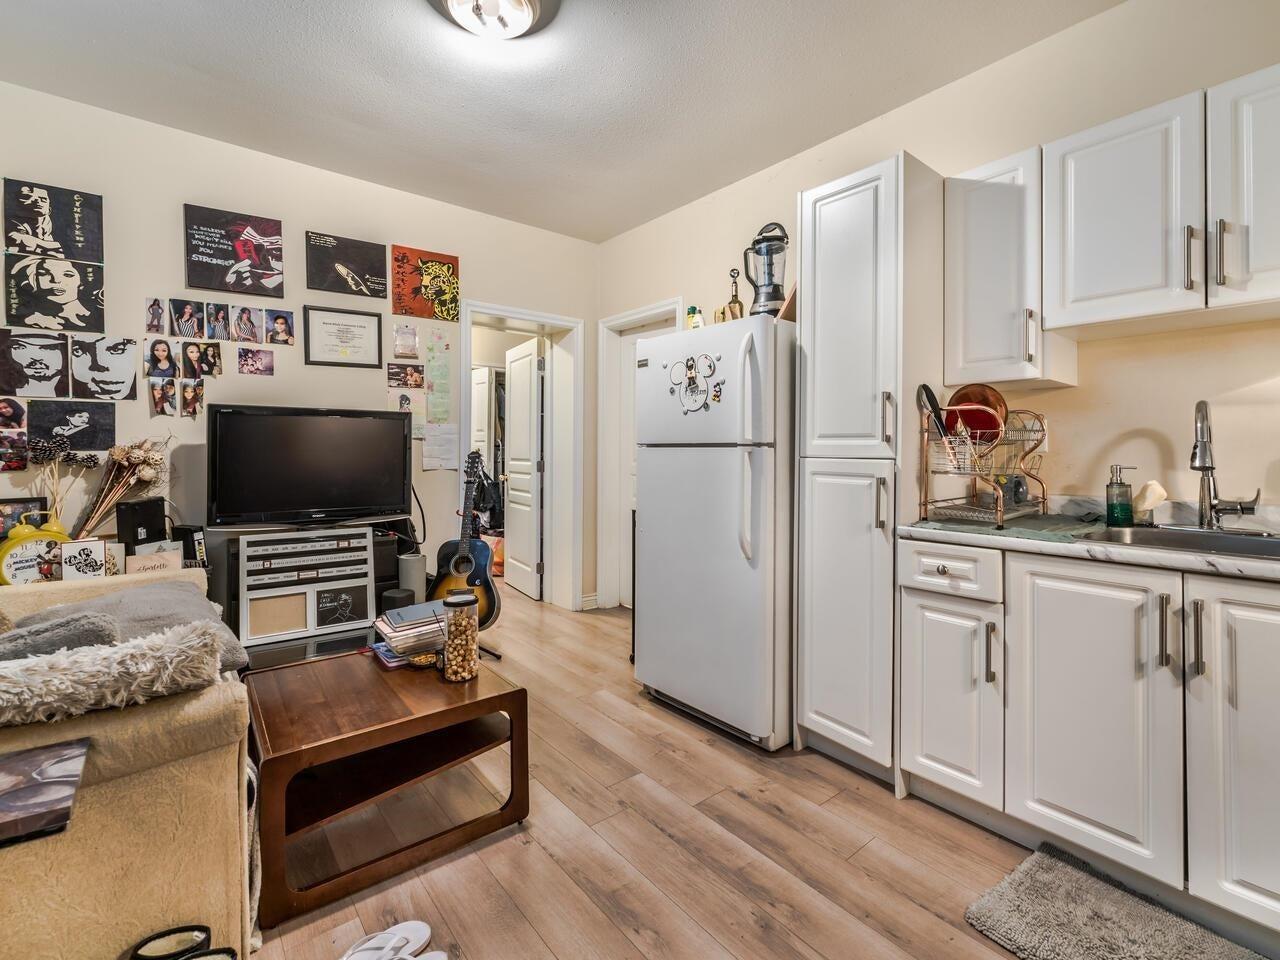 7888 JASPER CRESCENT - Fraserview VE House/Single Family for sale, 7 Bedrooms (R2622945) - #15